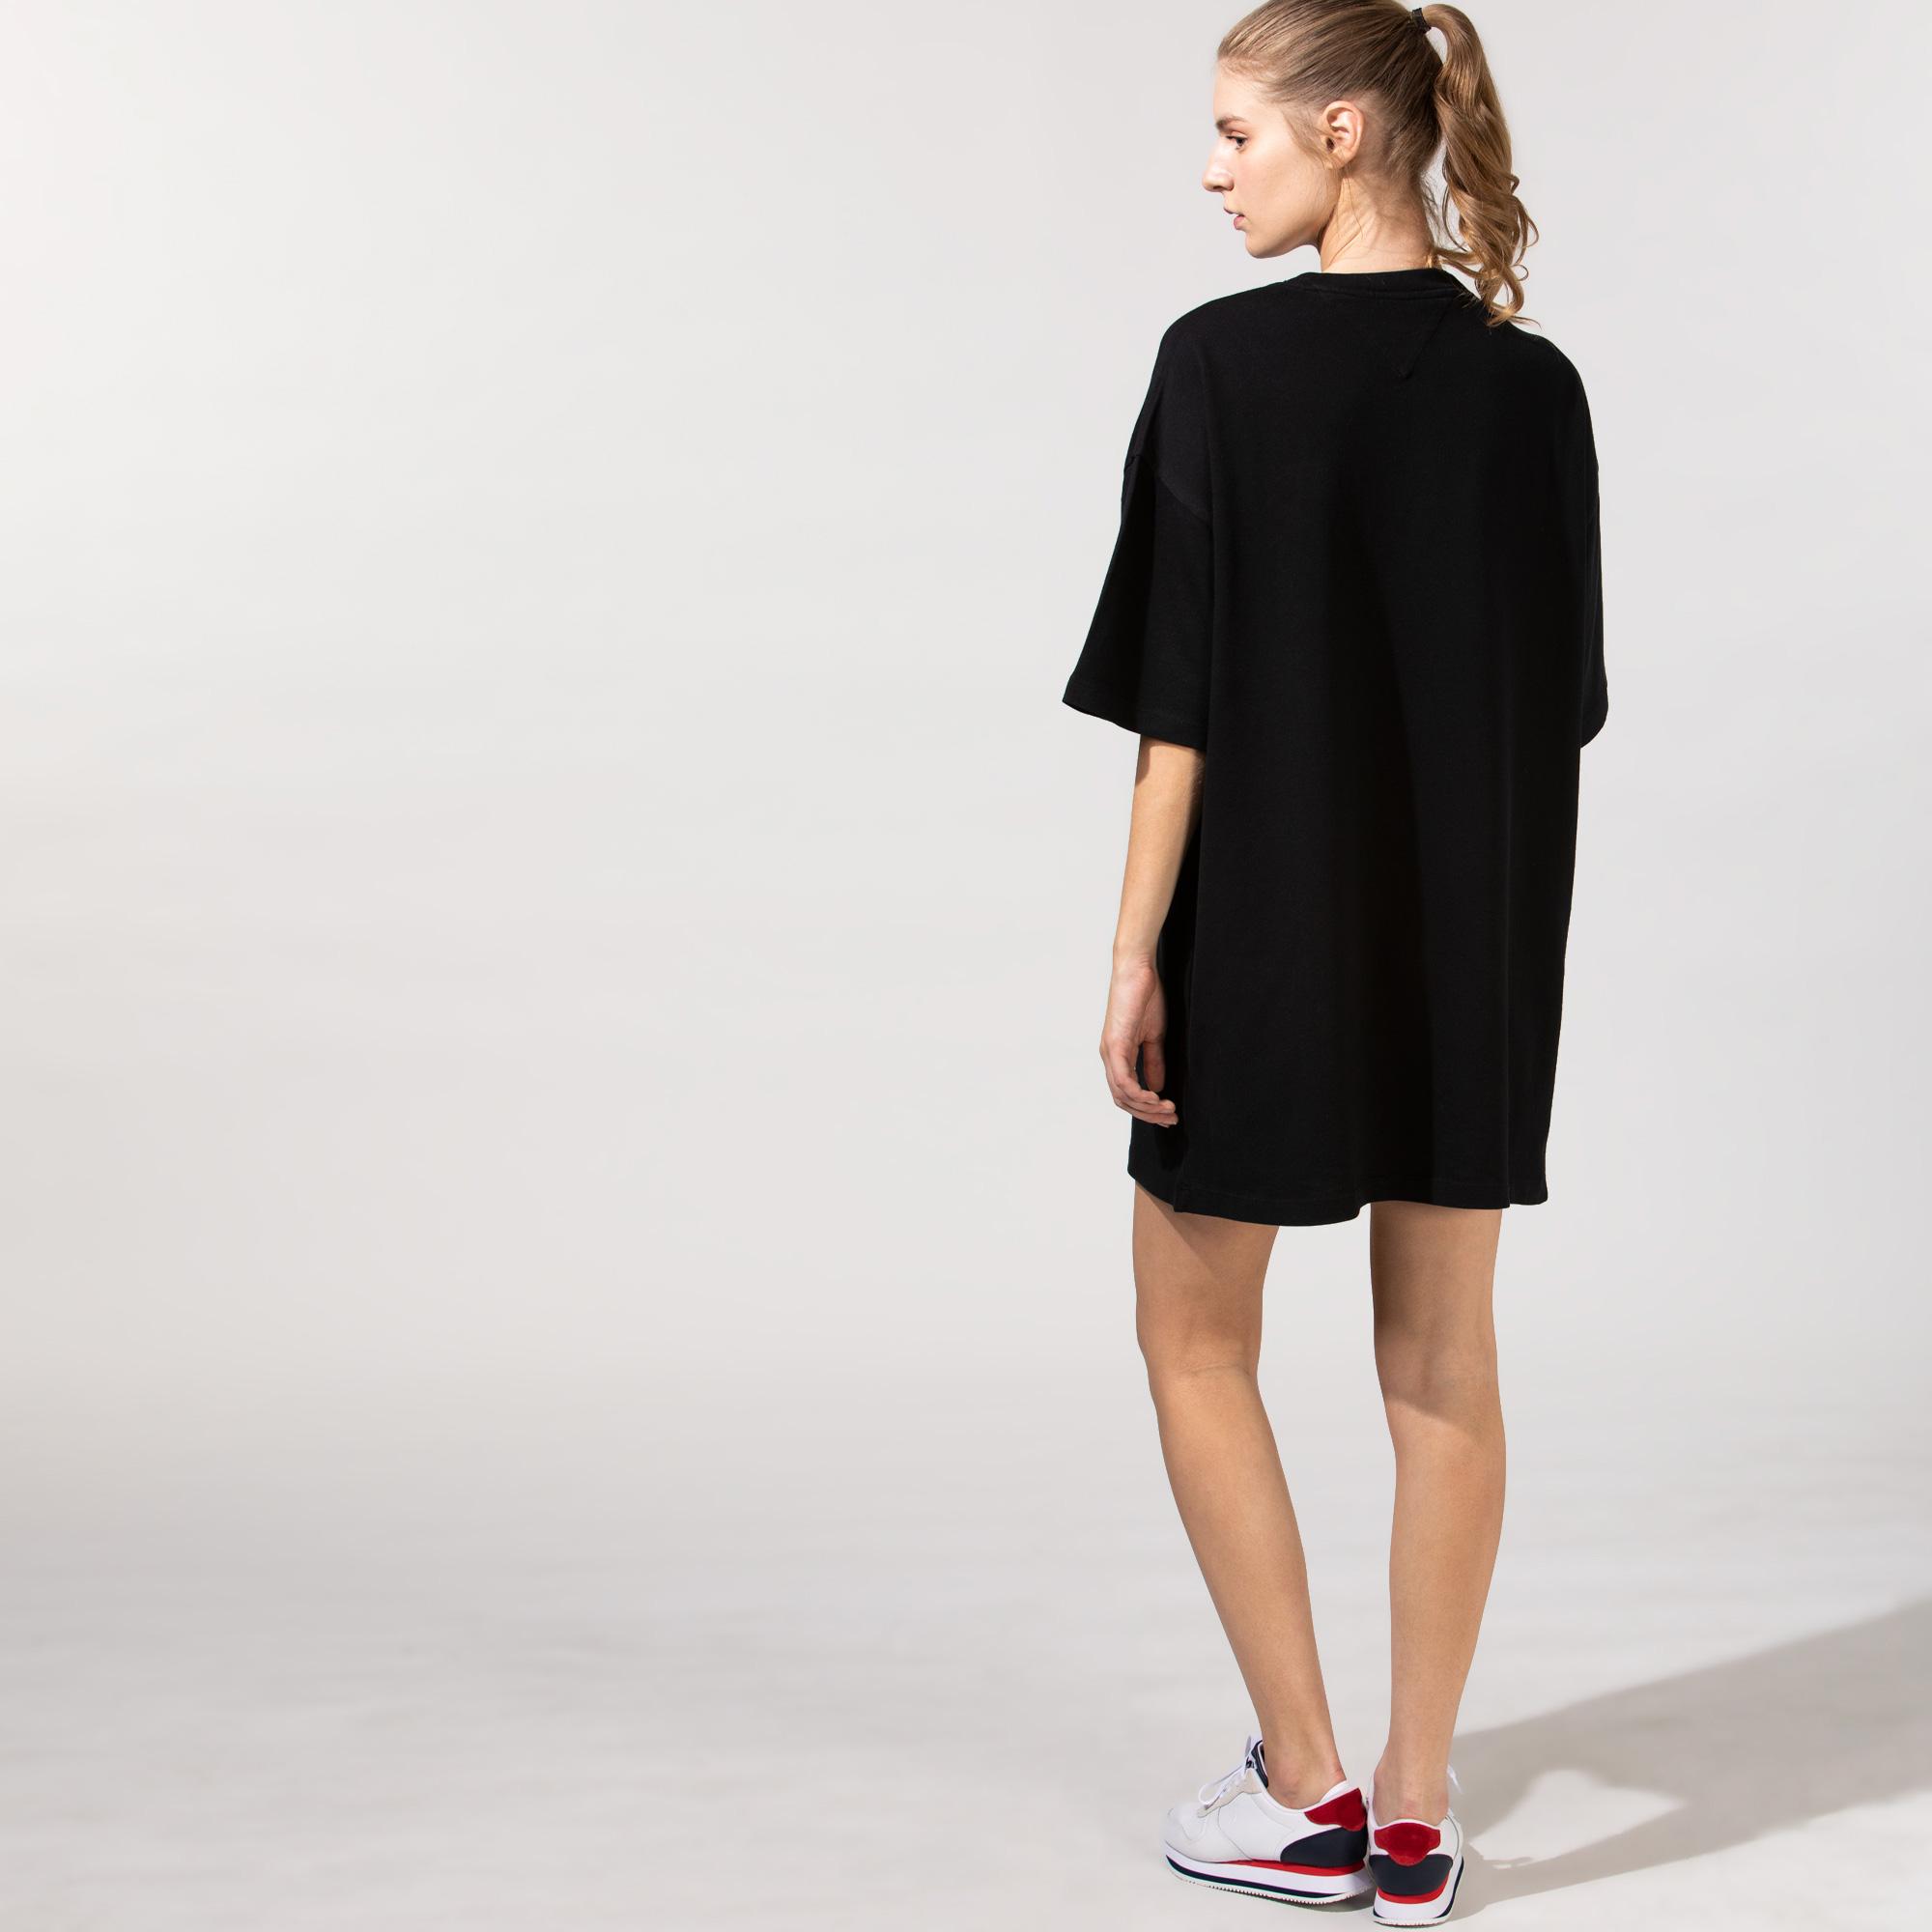 Tommy Hilfiger TJW Oversized Badge Kadın Siyah Elbise